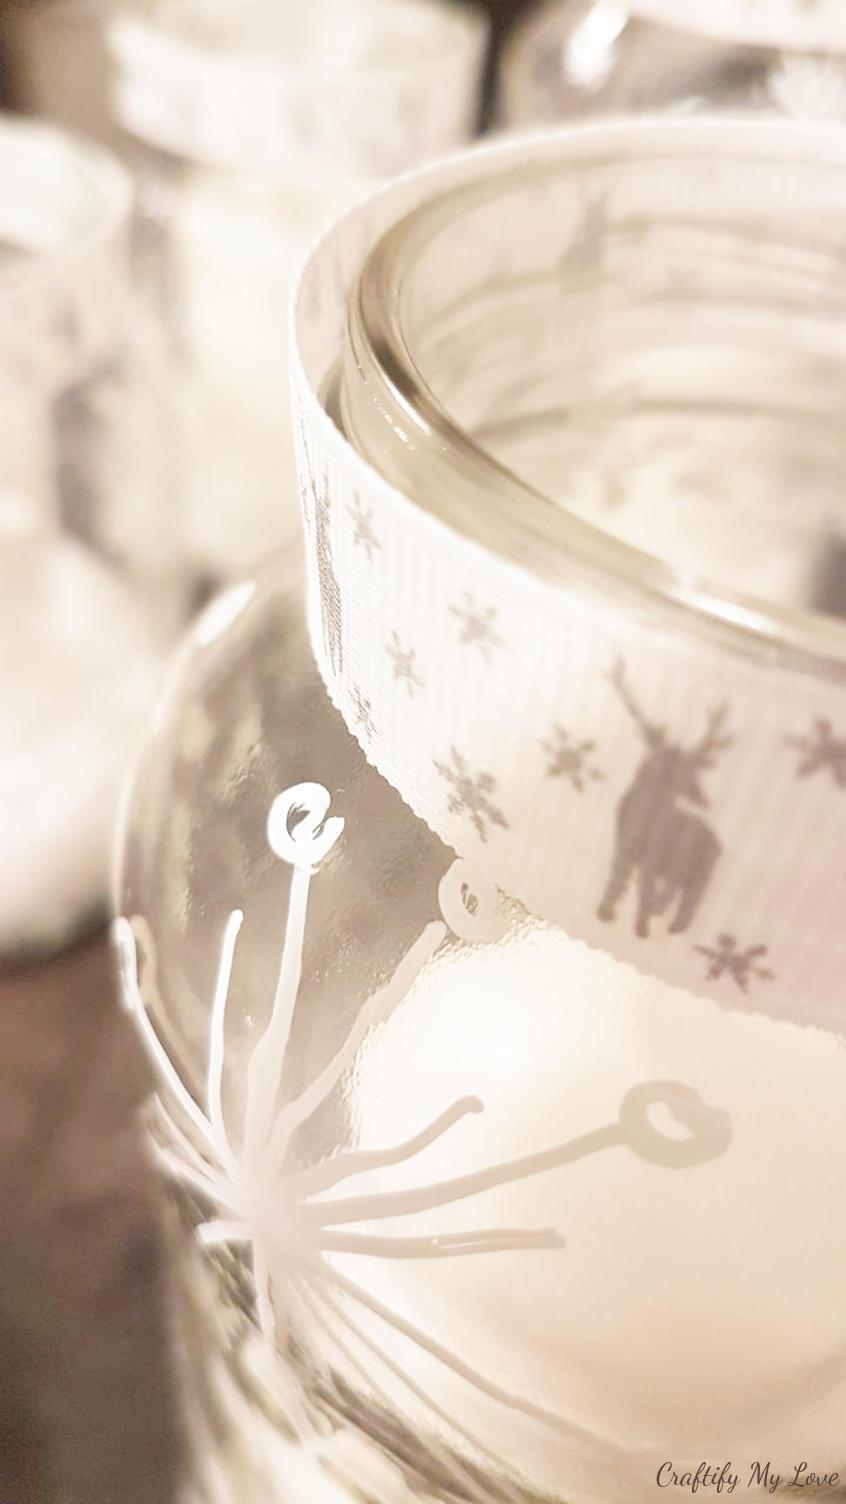 Upcycling jam jars into Christmas candle holders